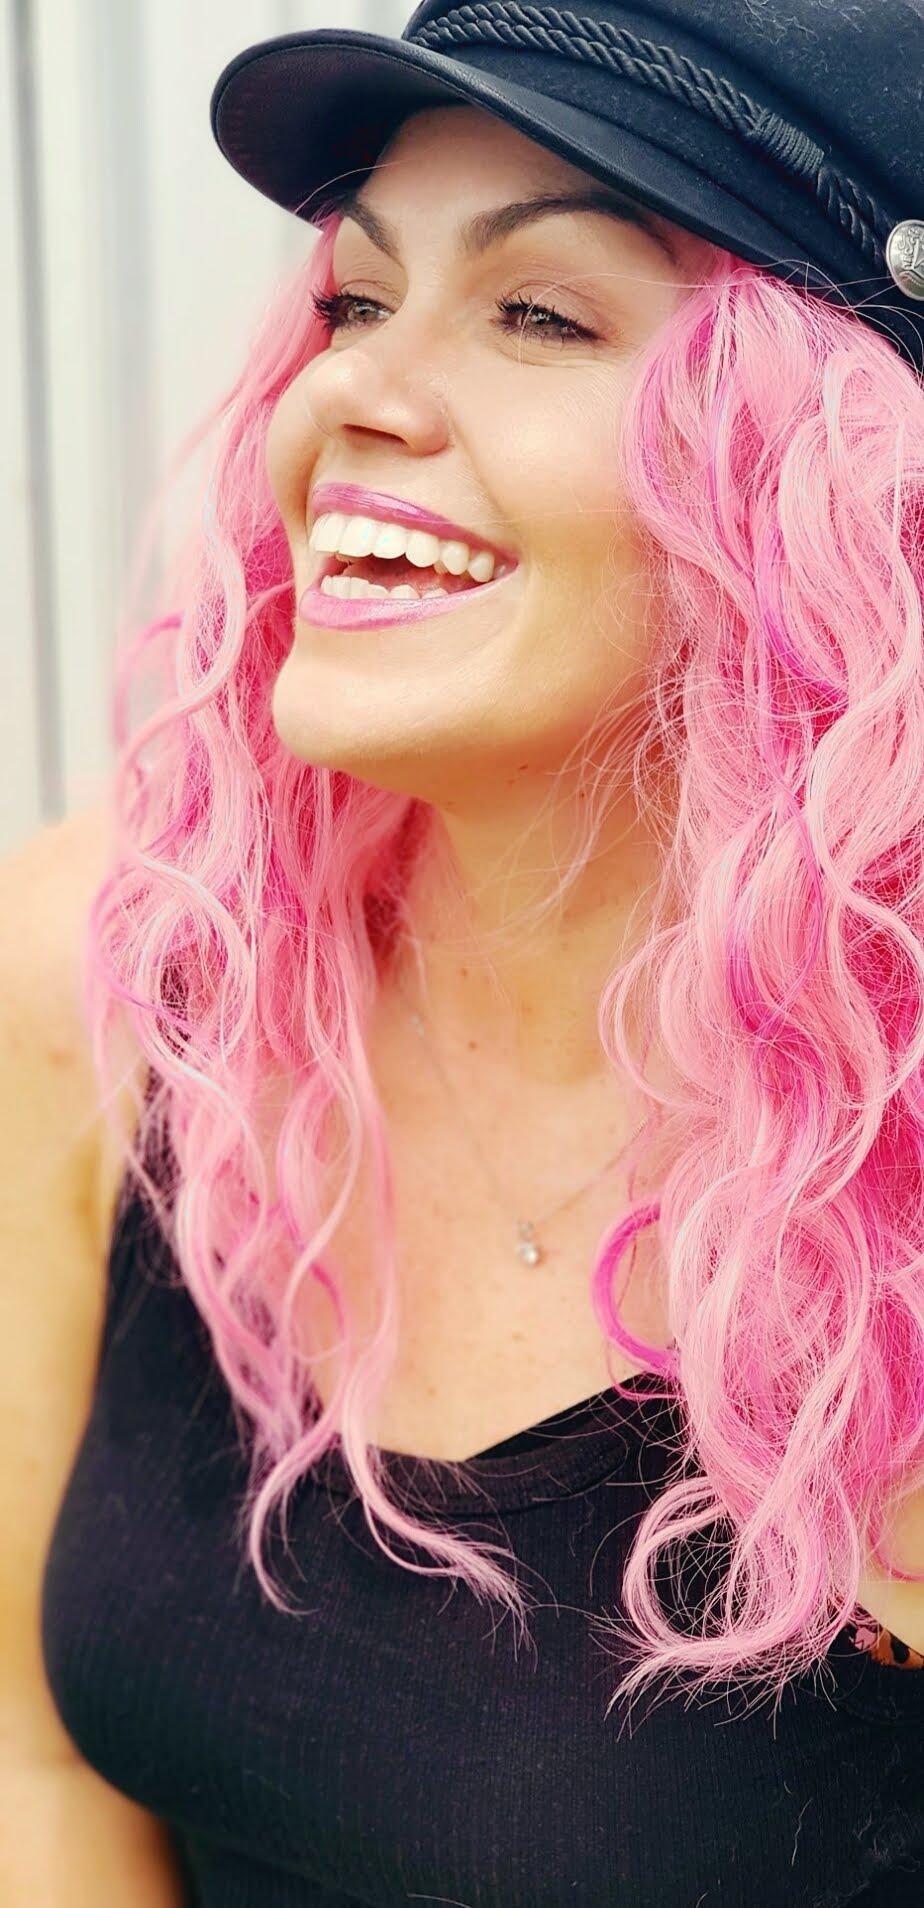 samantha clark waters confidence blog lifestyle fashion pink hair